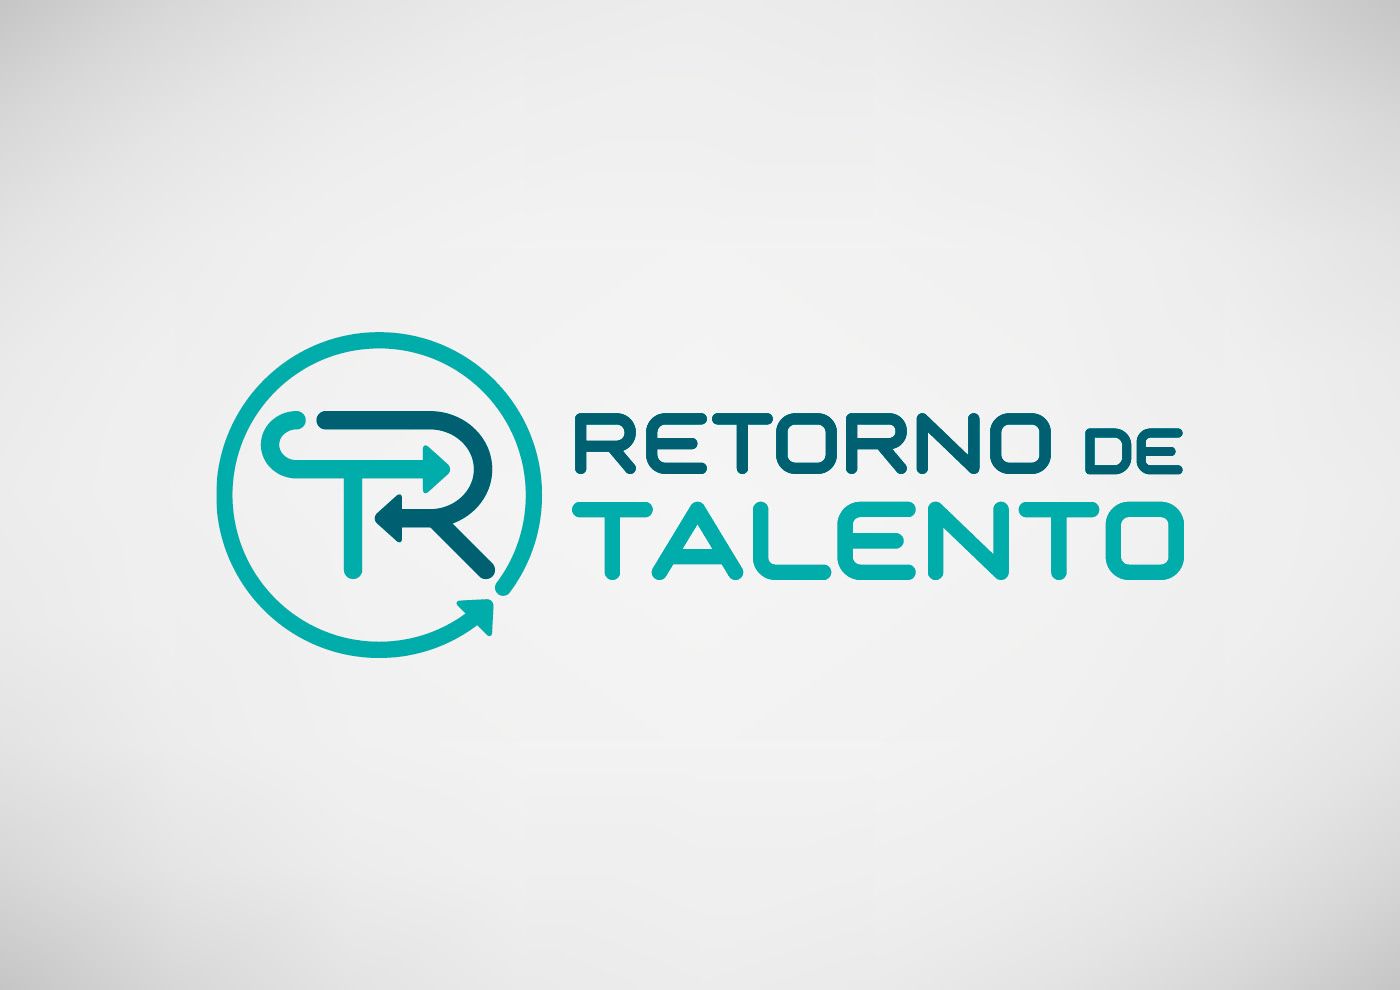 Retorno de Talento - Imagen corporativa - Ivan Diez